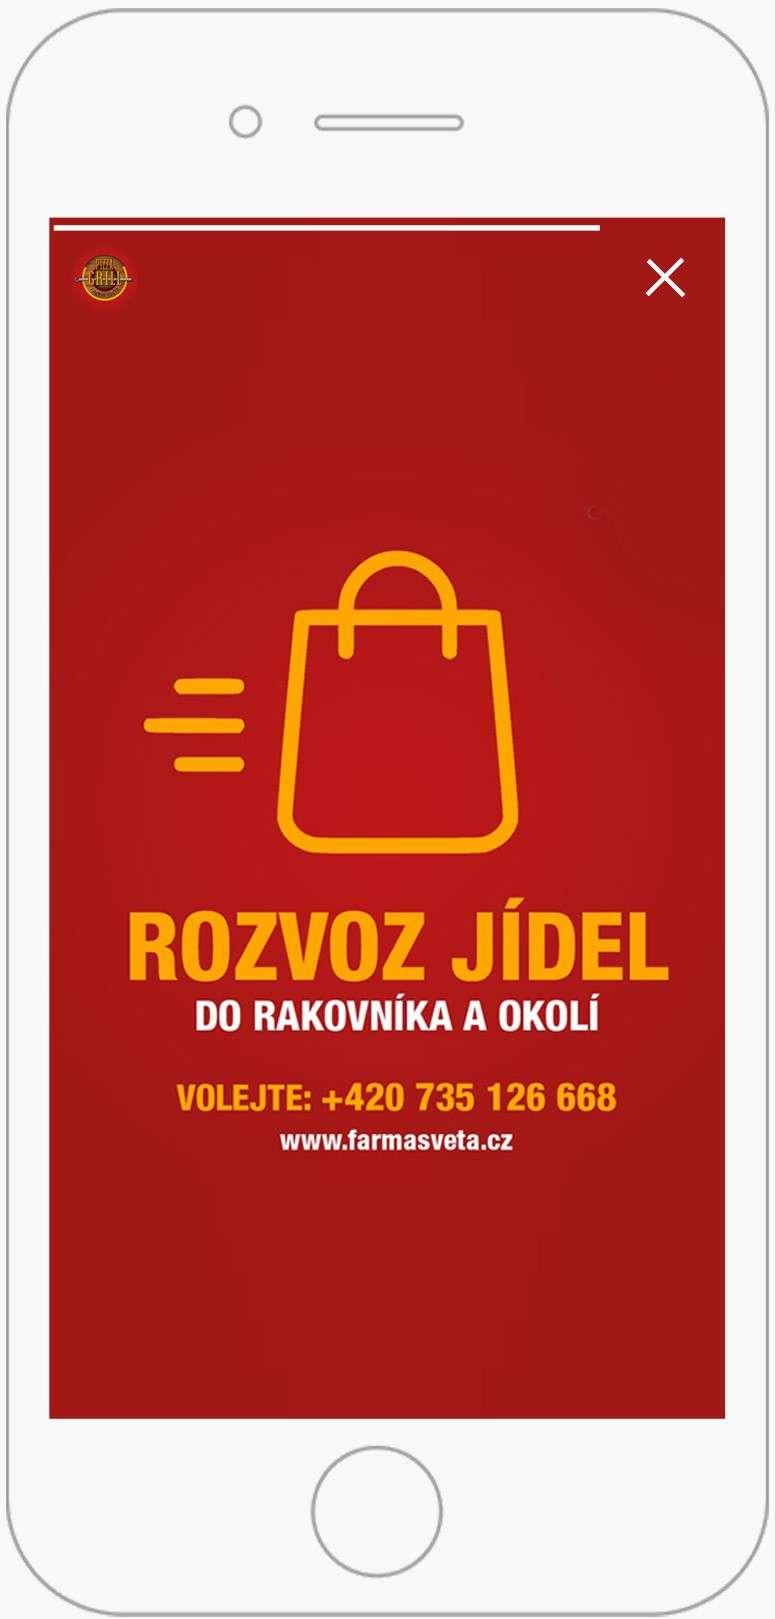 clubadvisor_reference_pizzagrillfarmasveta_on-line-marketing_instagram-single4